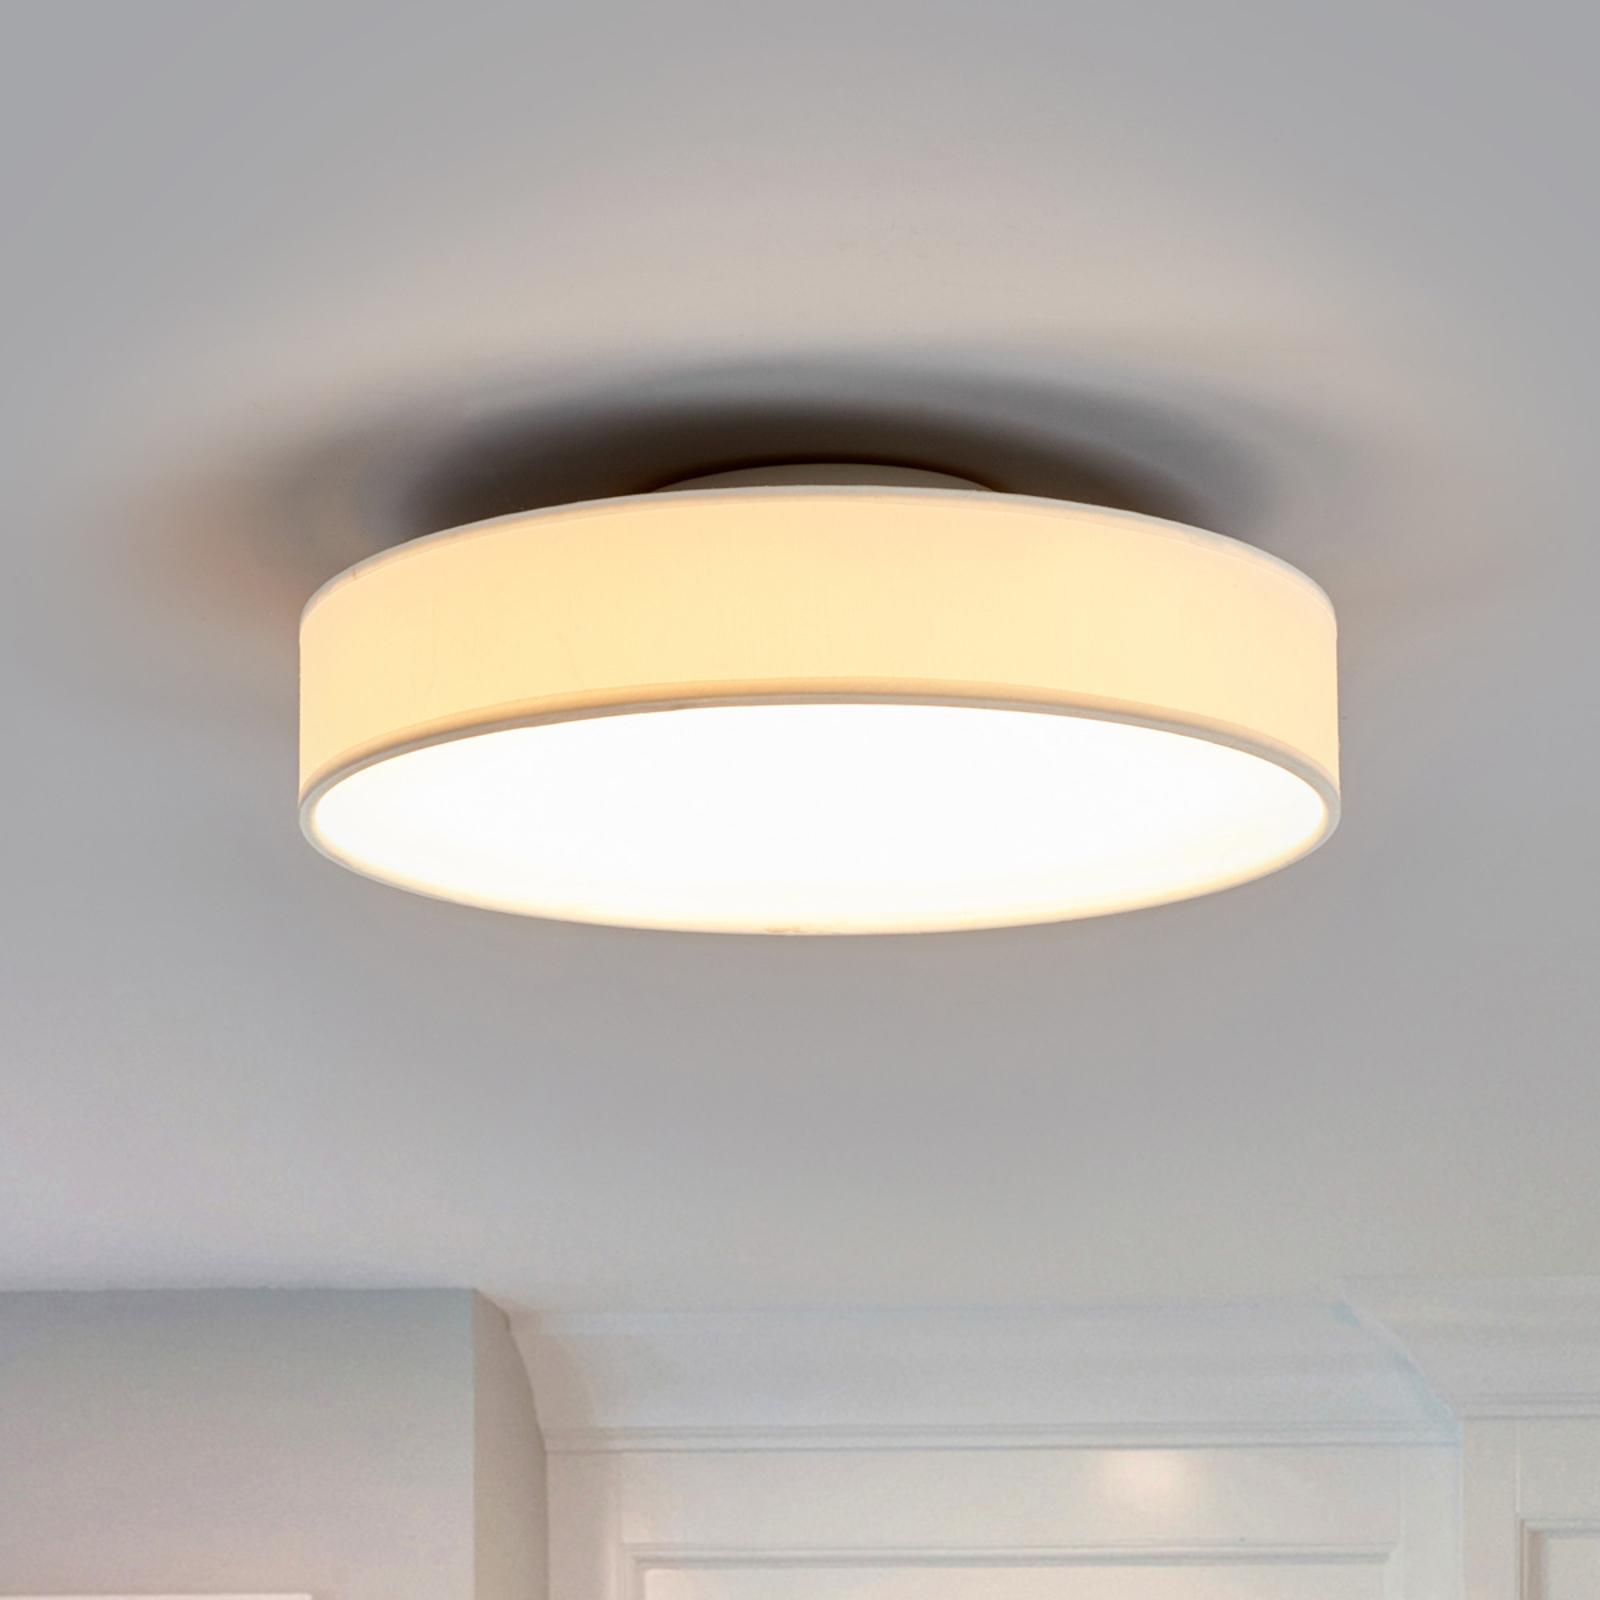 Lampa sufitowa LED z materiału Saira, 30 cm biała